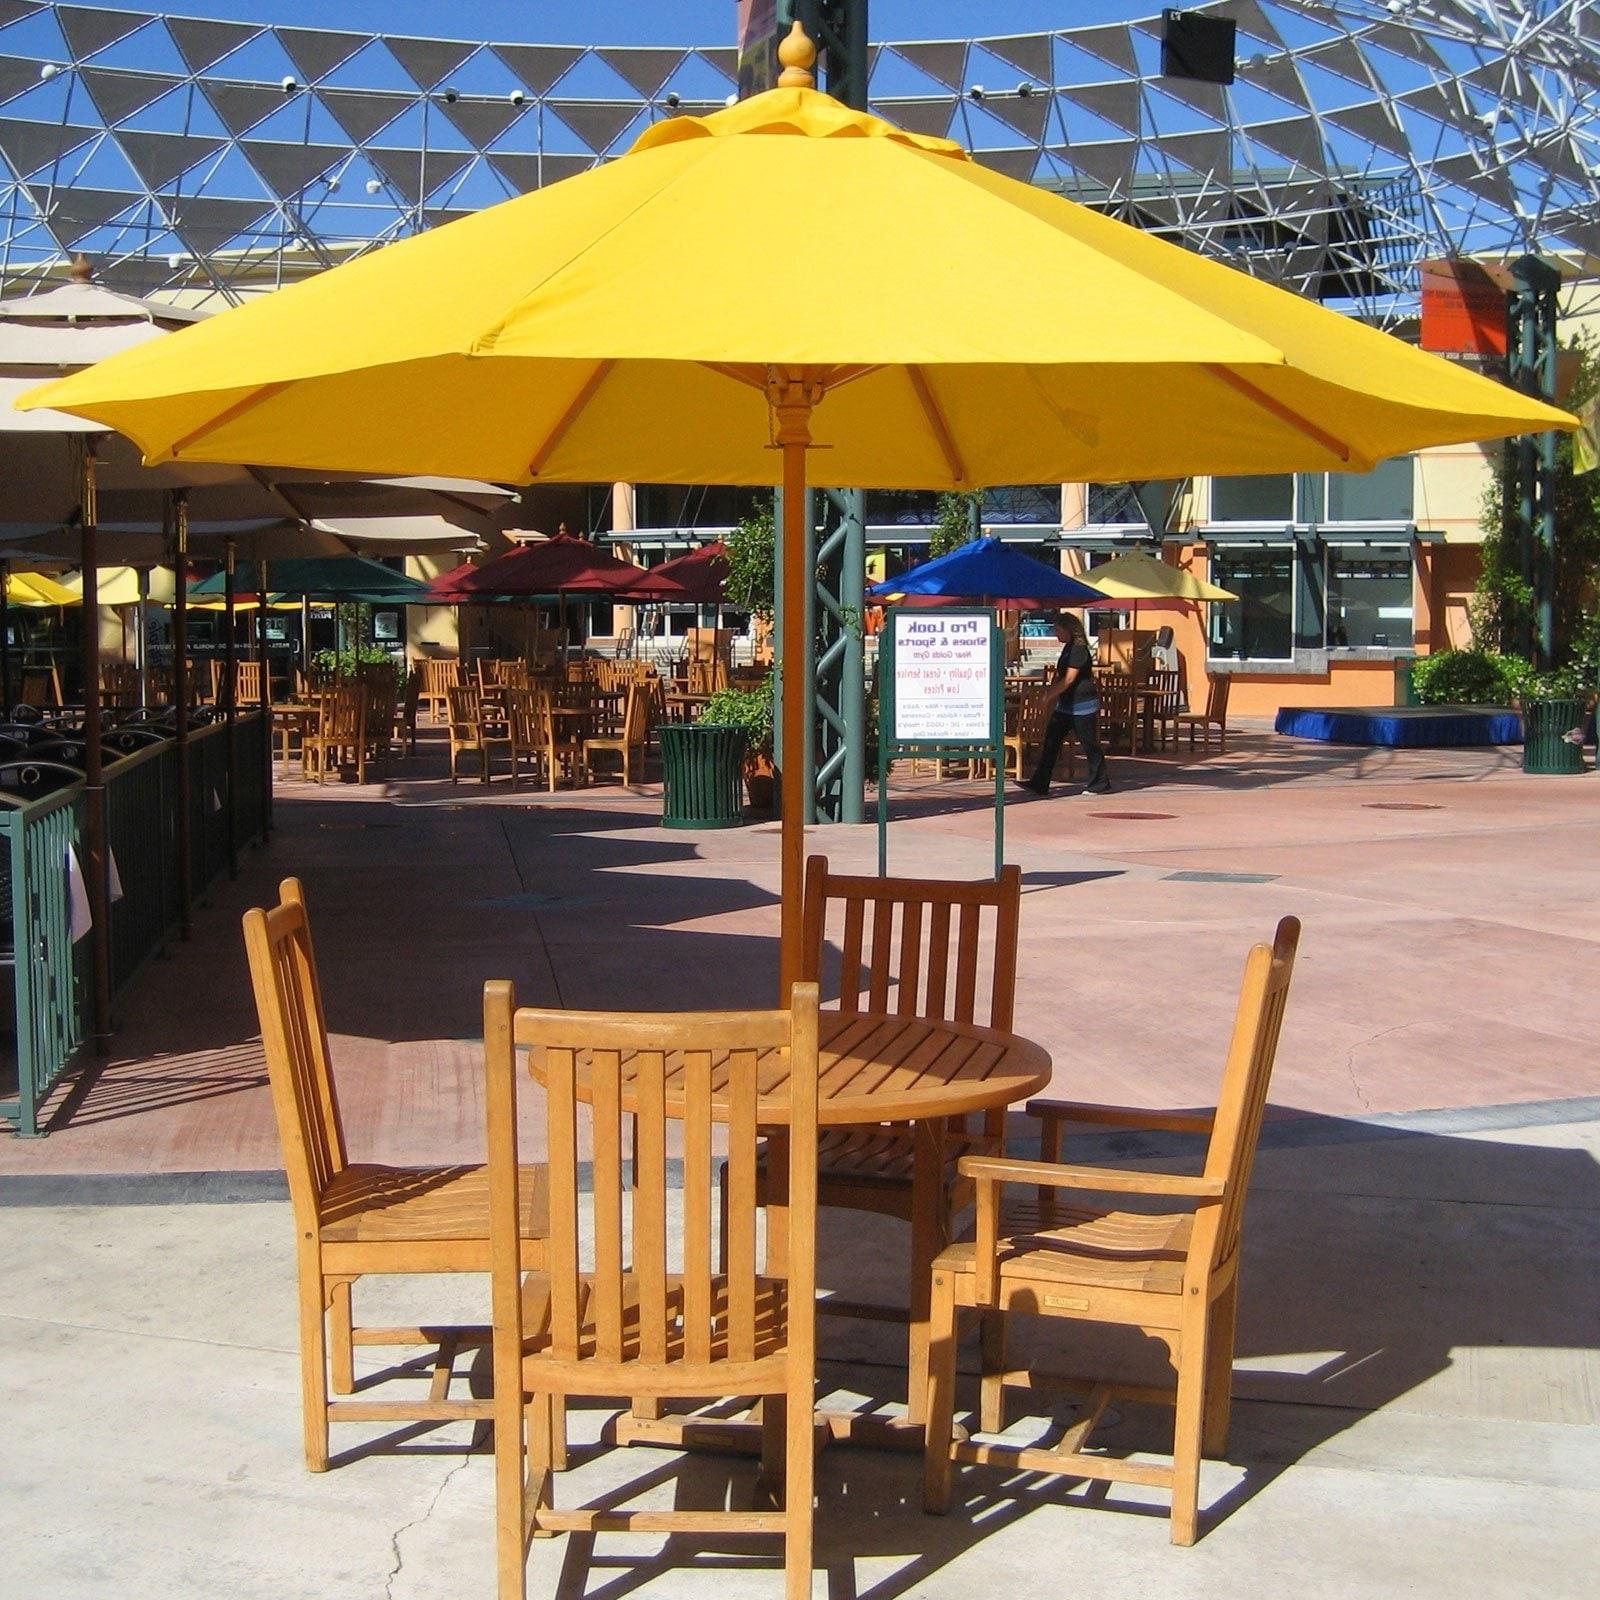 Sherizampelli Landscape : Elegant Within Favorite Cheap Patio Umbrellas (View 9 of 20)